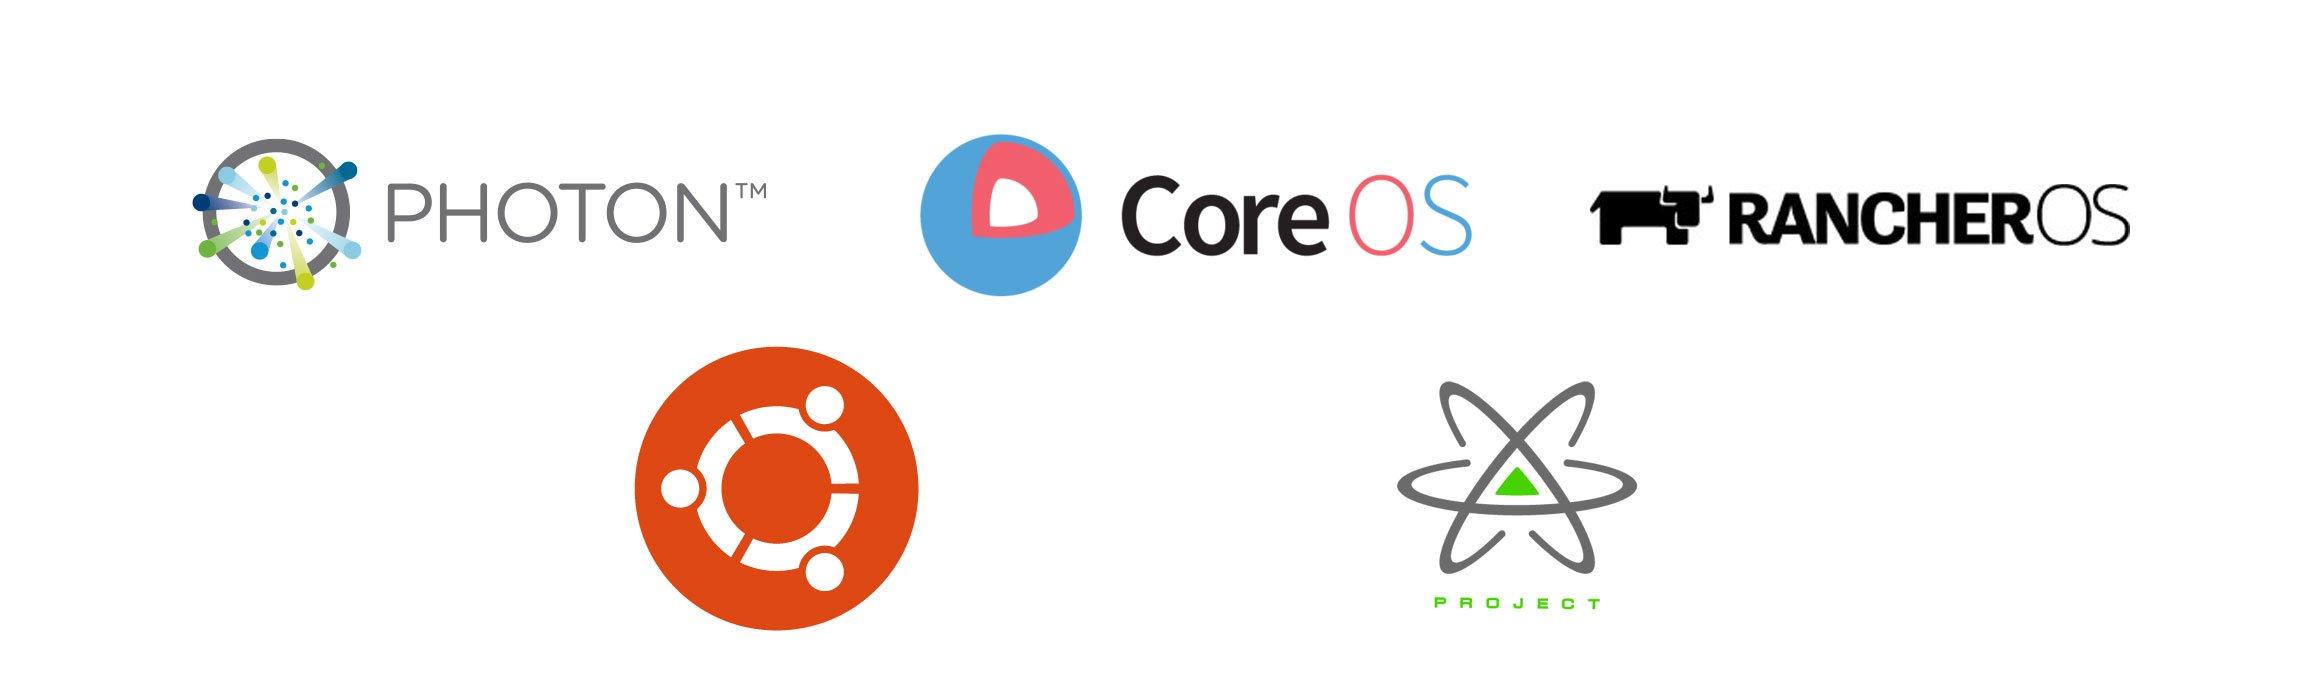 Docker-OS-Vergleich Logos